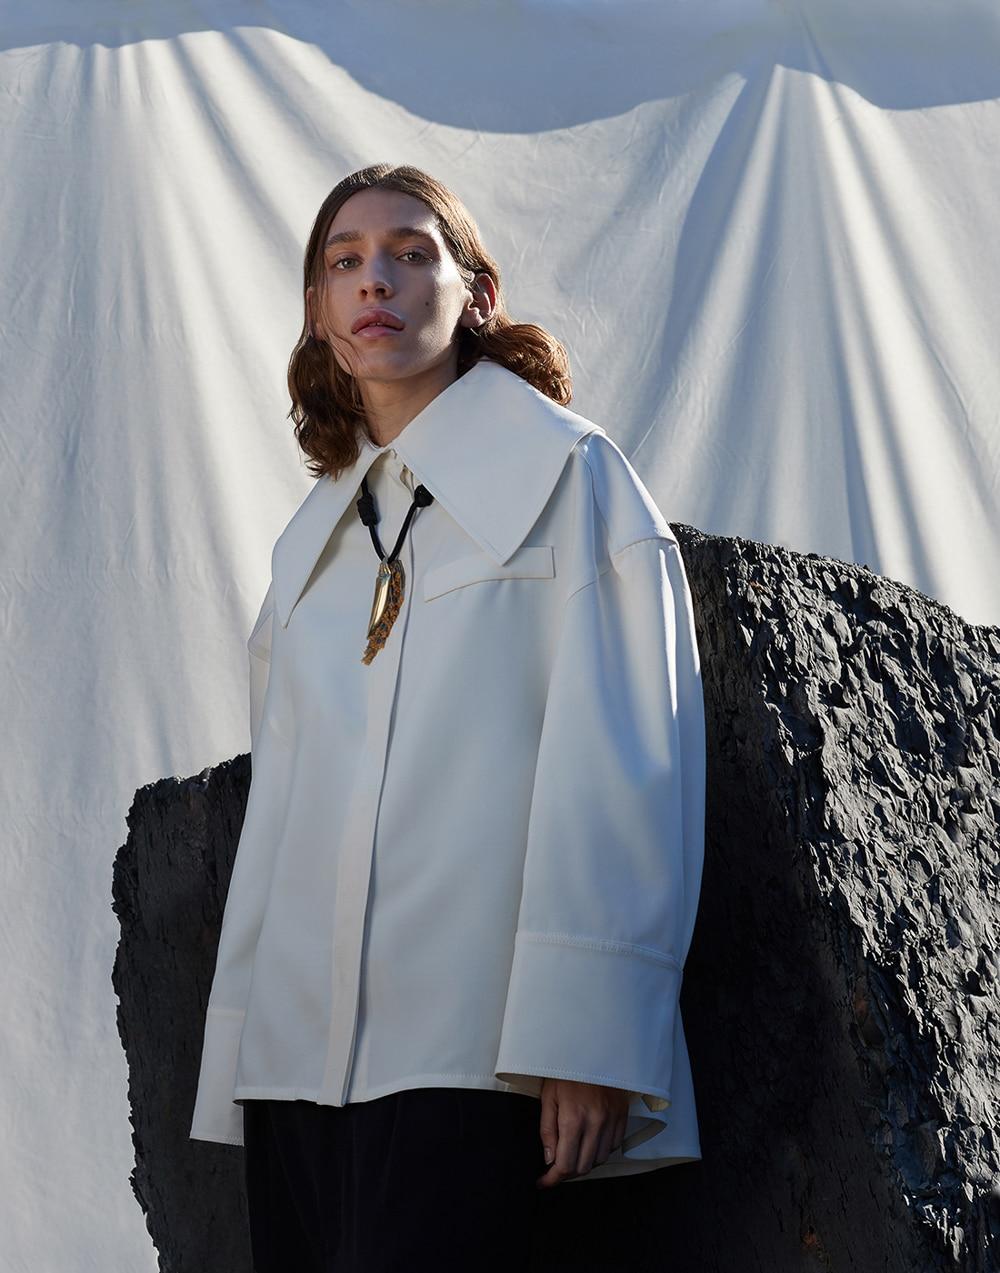 Monrowe-Magazine-November-2017-Zarina-Nares-Manolo-Campion-1.jpg